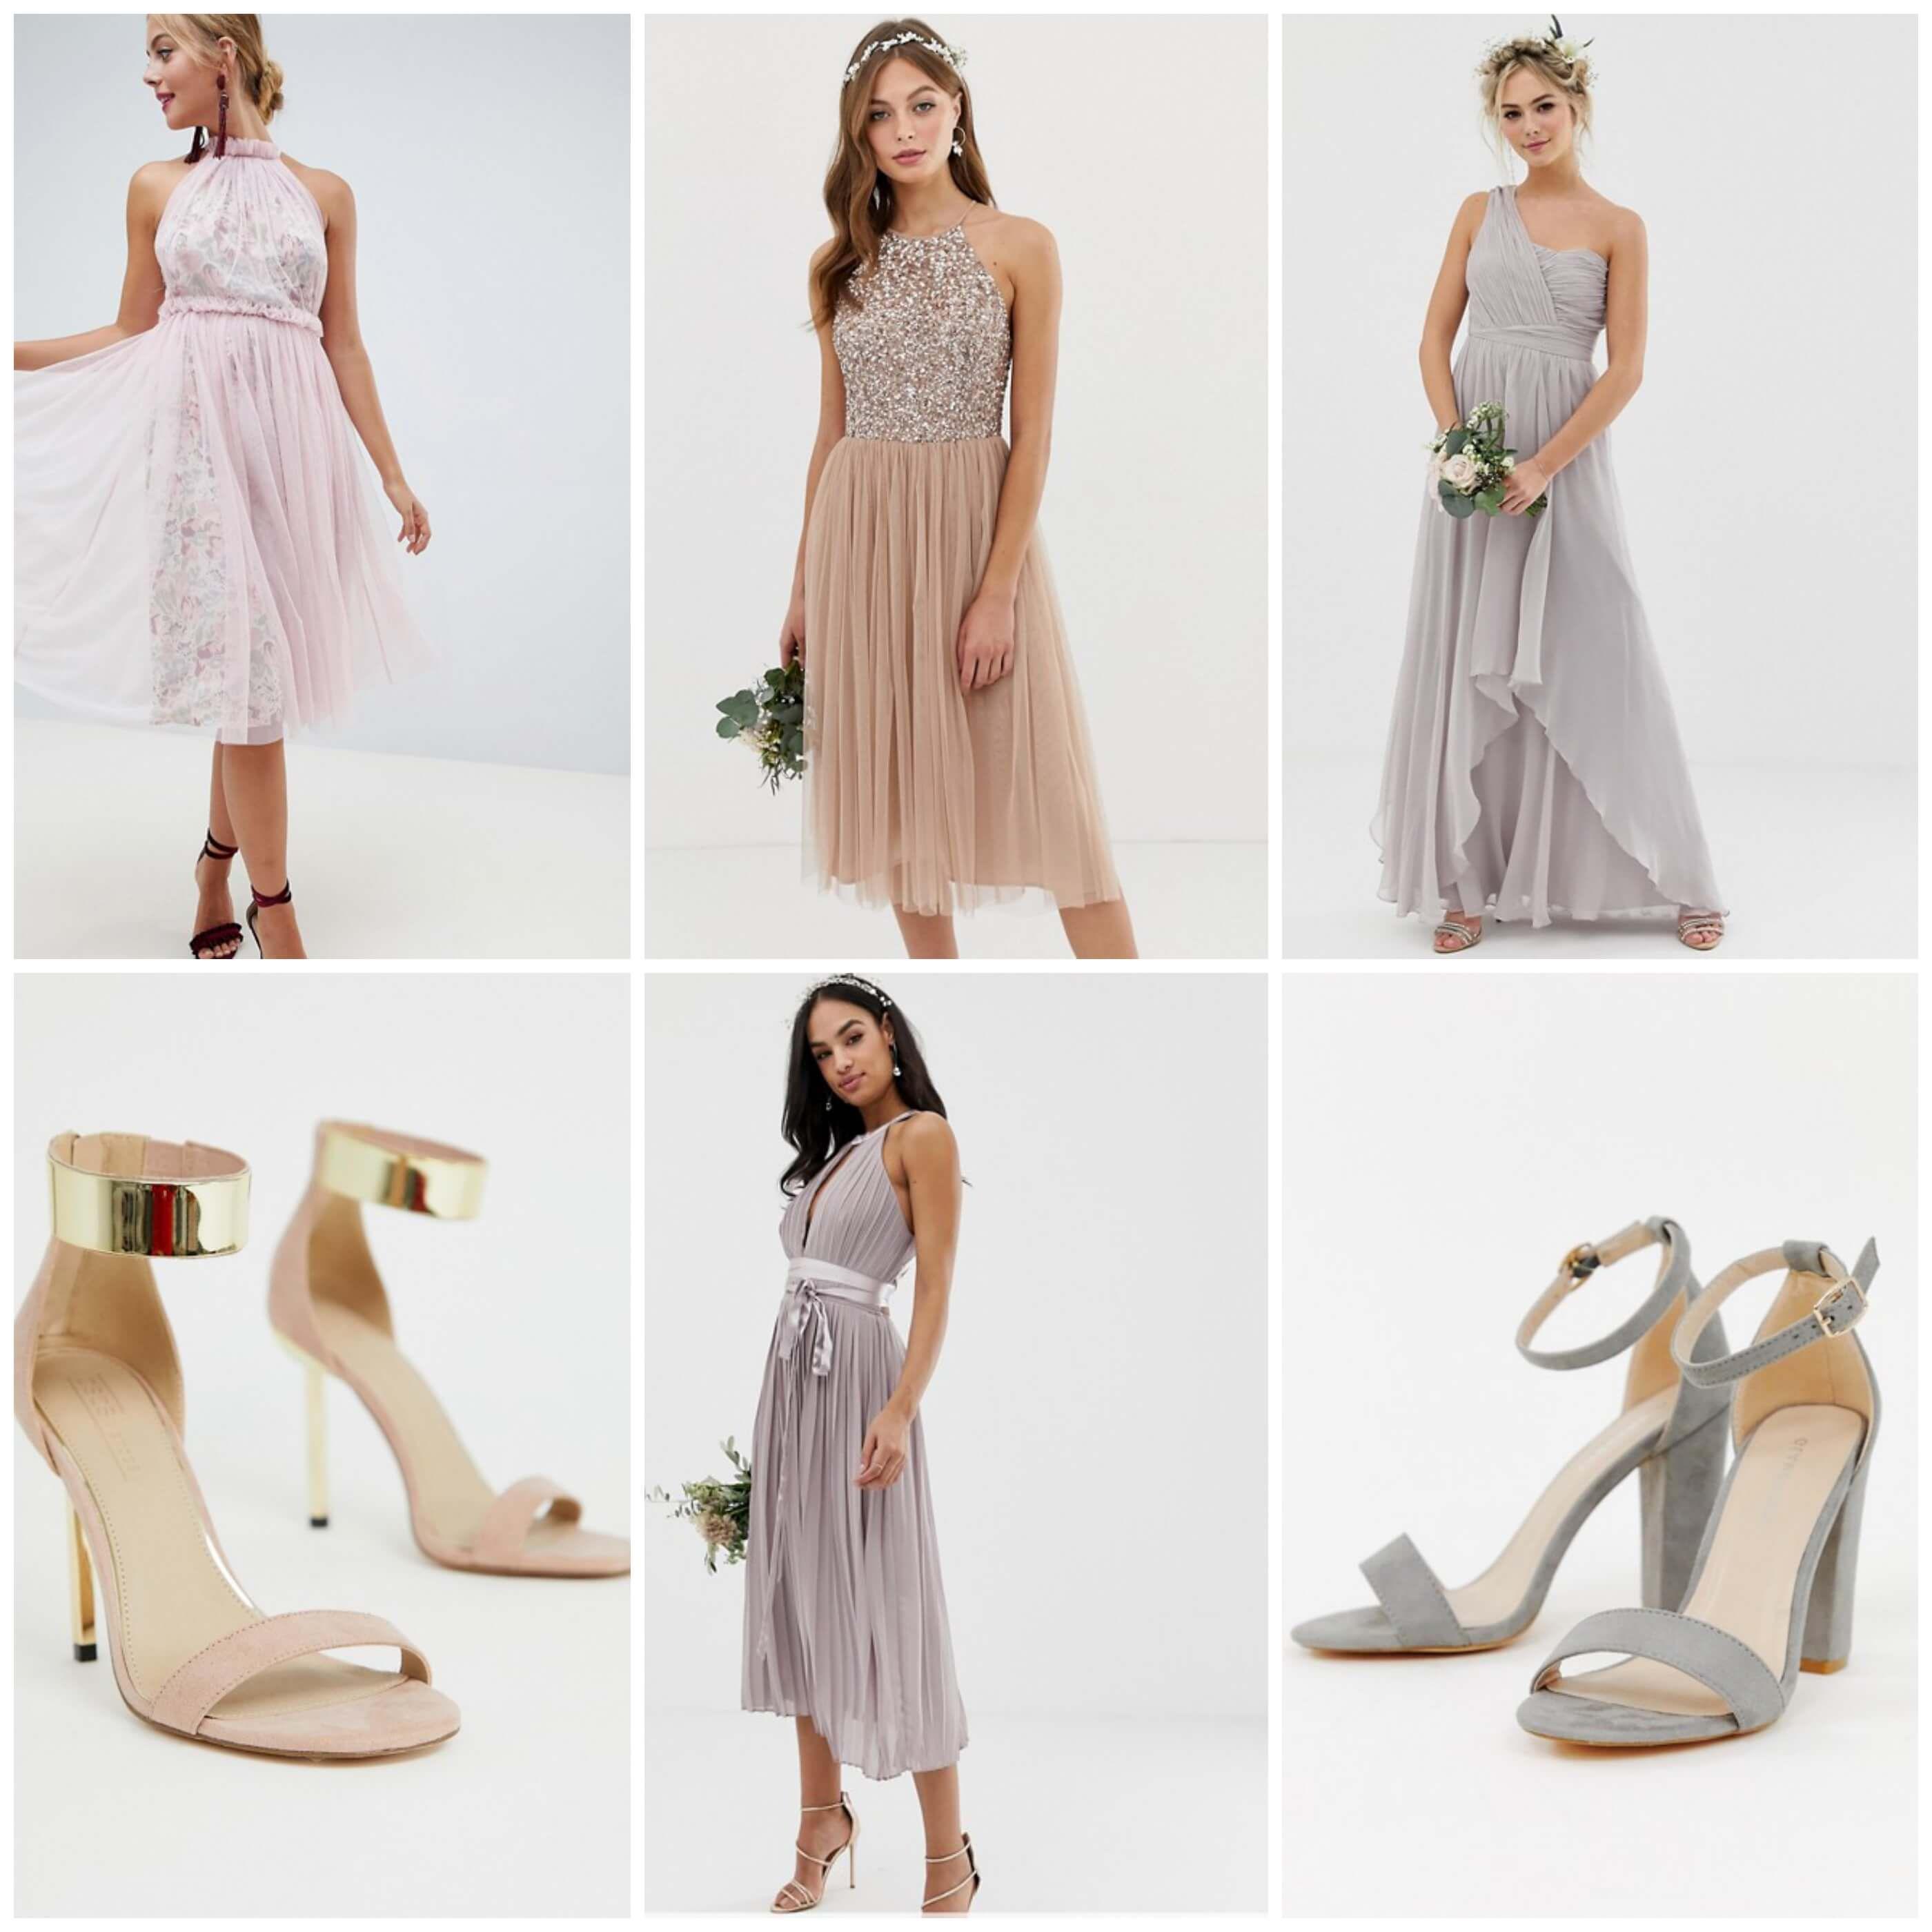 Hochzeitsgast Outfit Outfit Hochzeit Hochzeitsgast Outfit Hochzeit